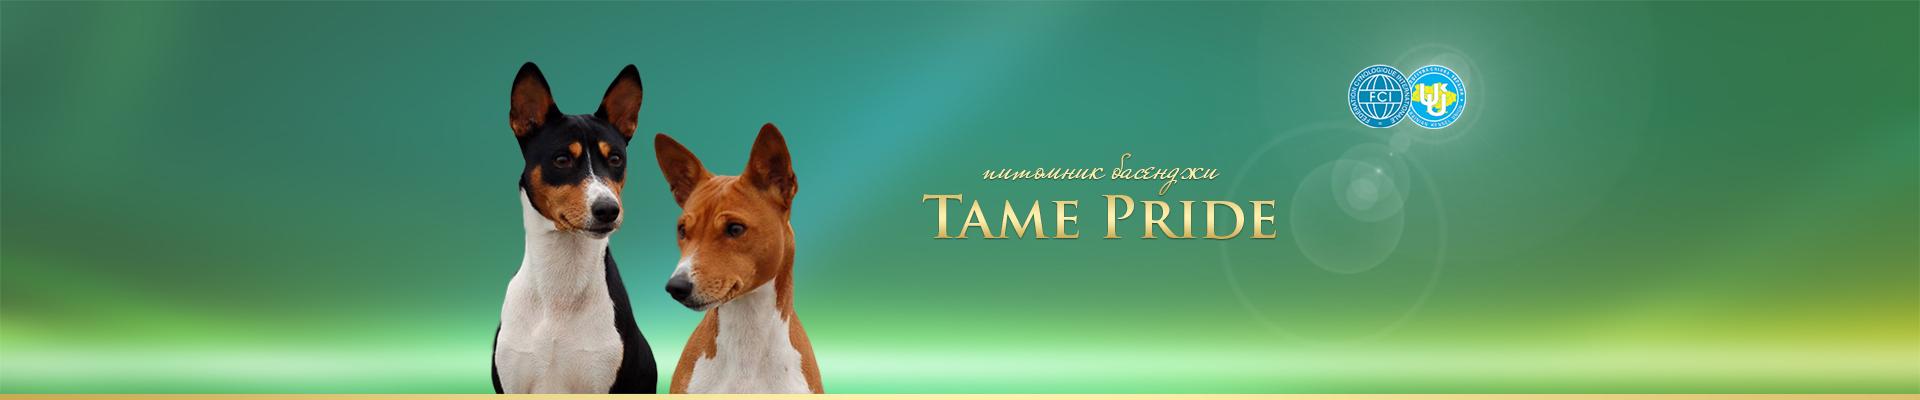 Tame Pride